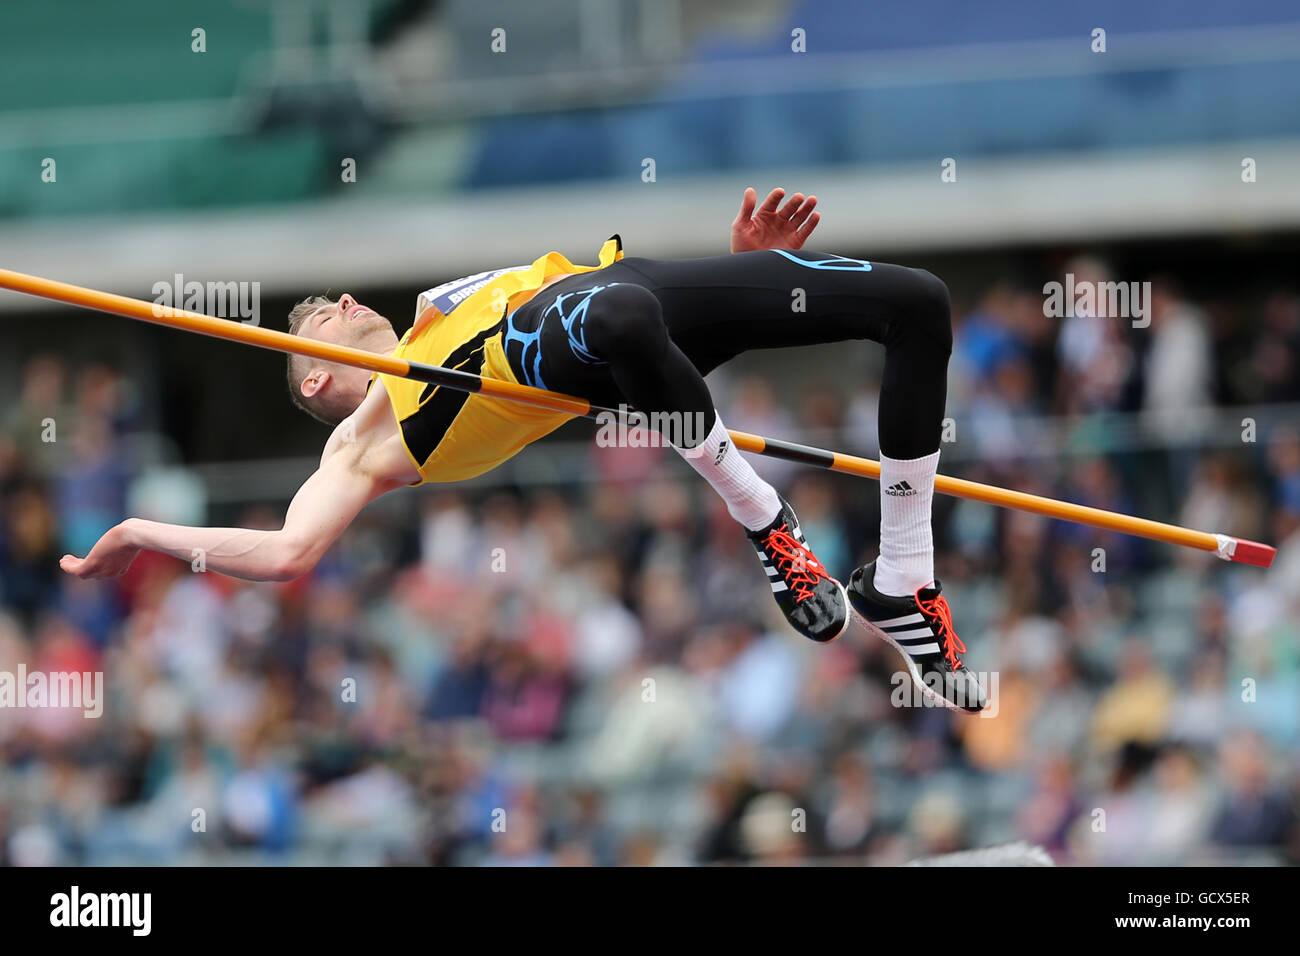 Matthew ROBERTS Men's High Jump Final, 2016 British Championships; Birmingham Alexander Stadium UK. - Stock Image